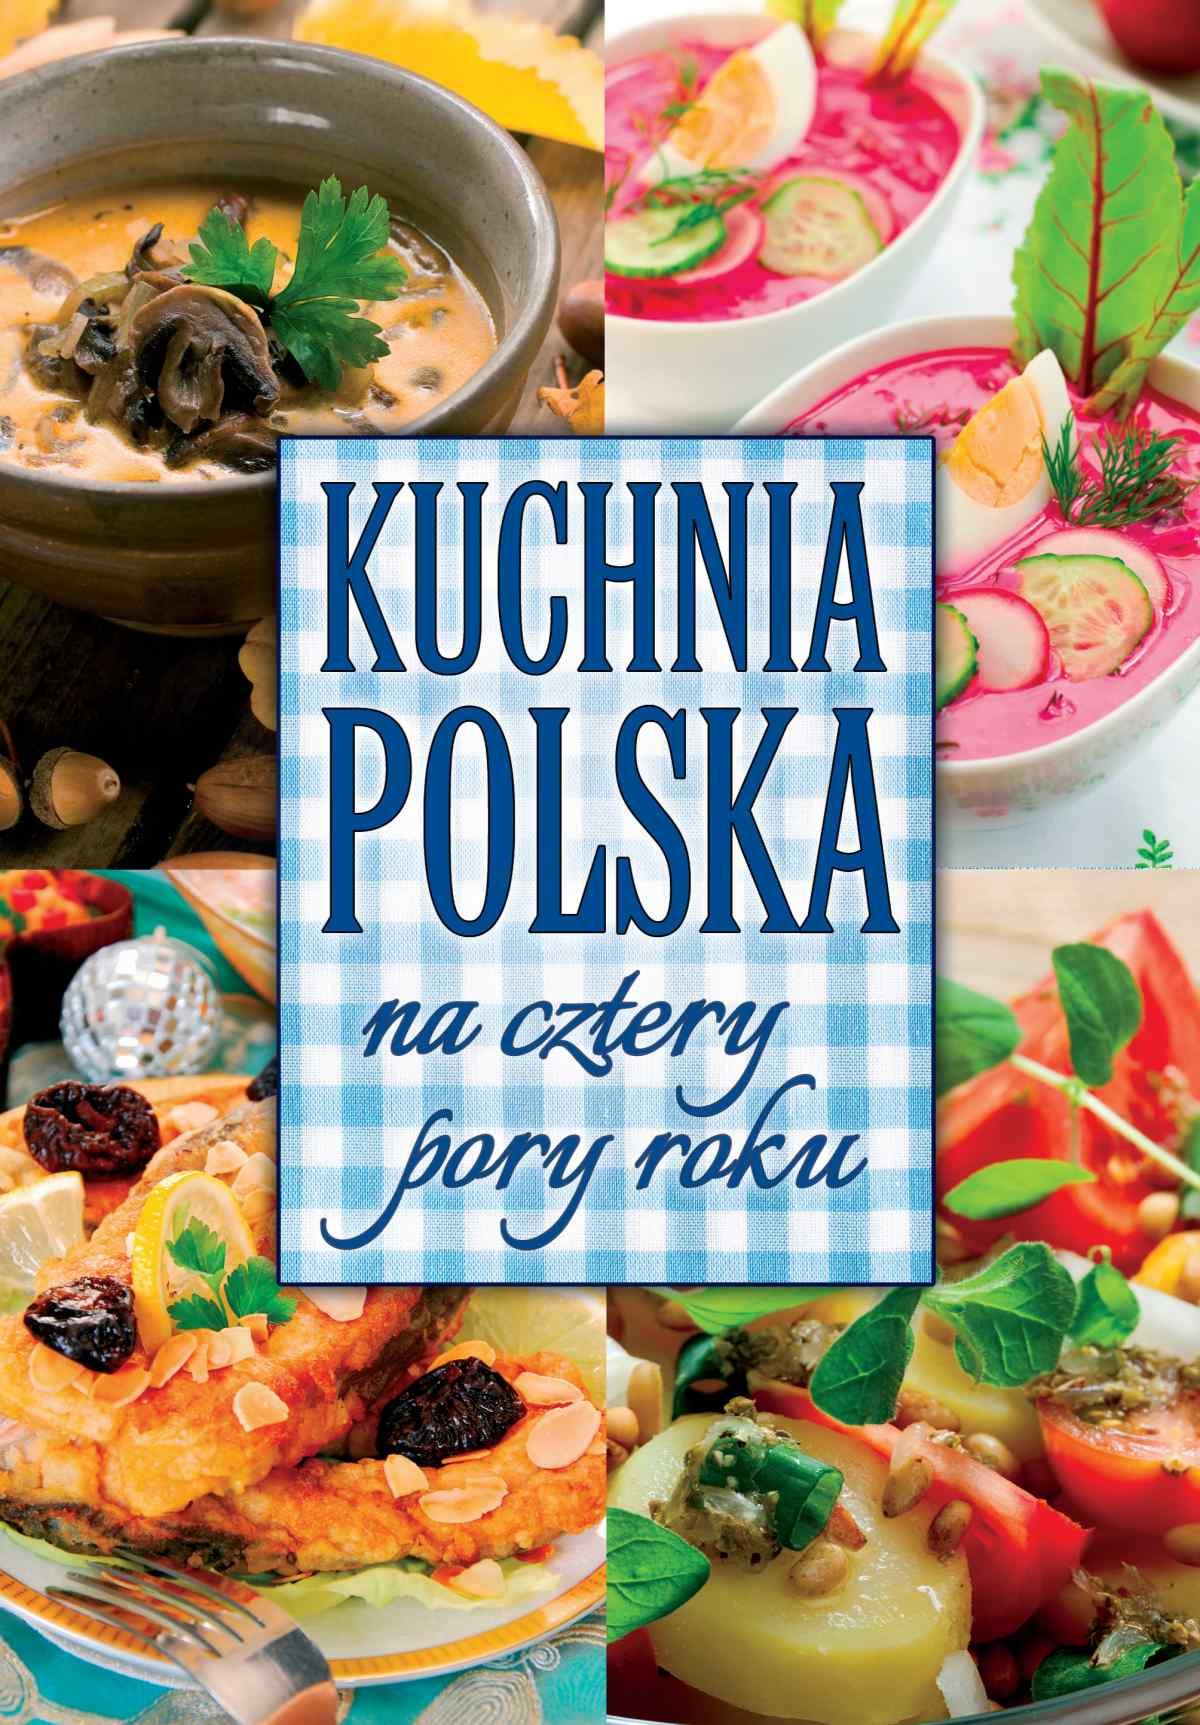 Kuchnia polska na cztery pory roku - Ebook (Książka PDF) do pobrania w formacie PDF